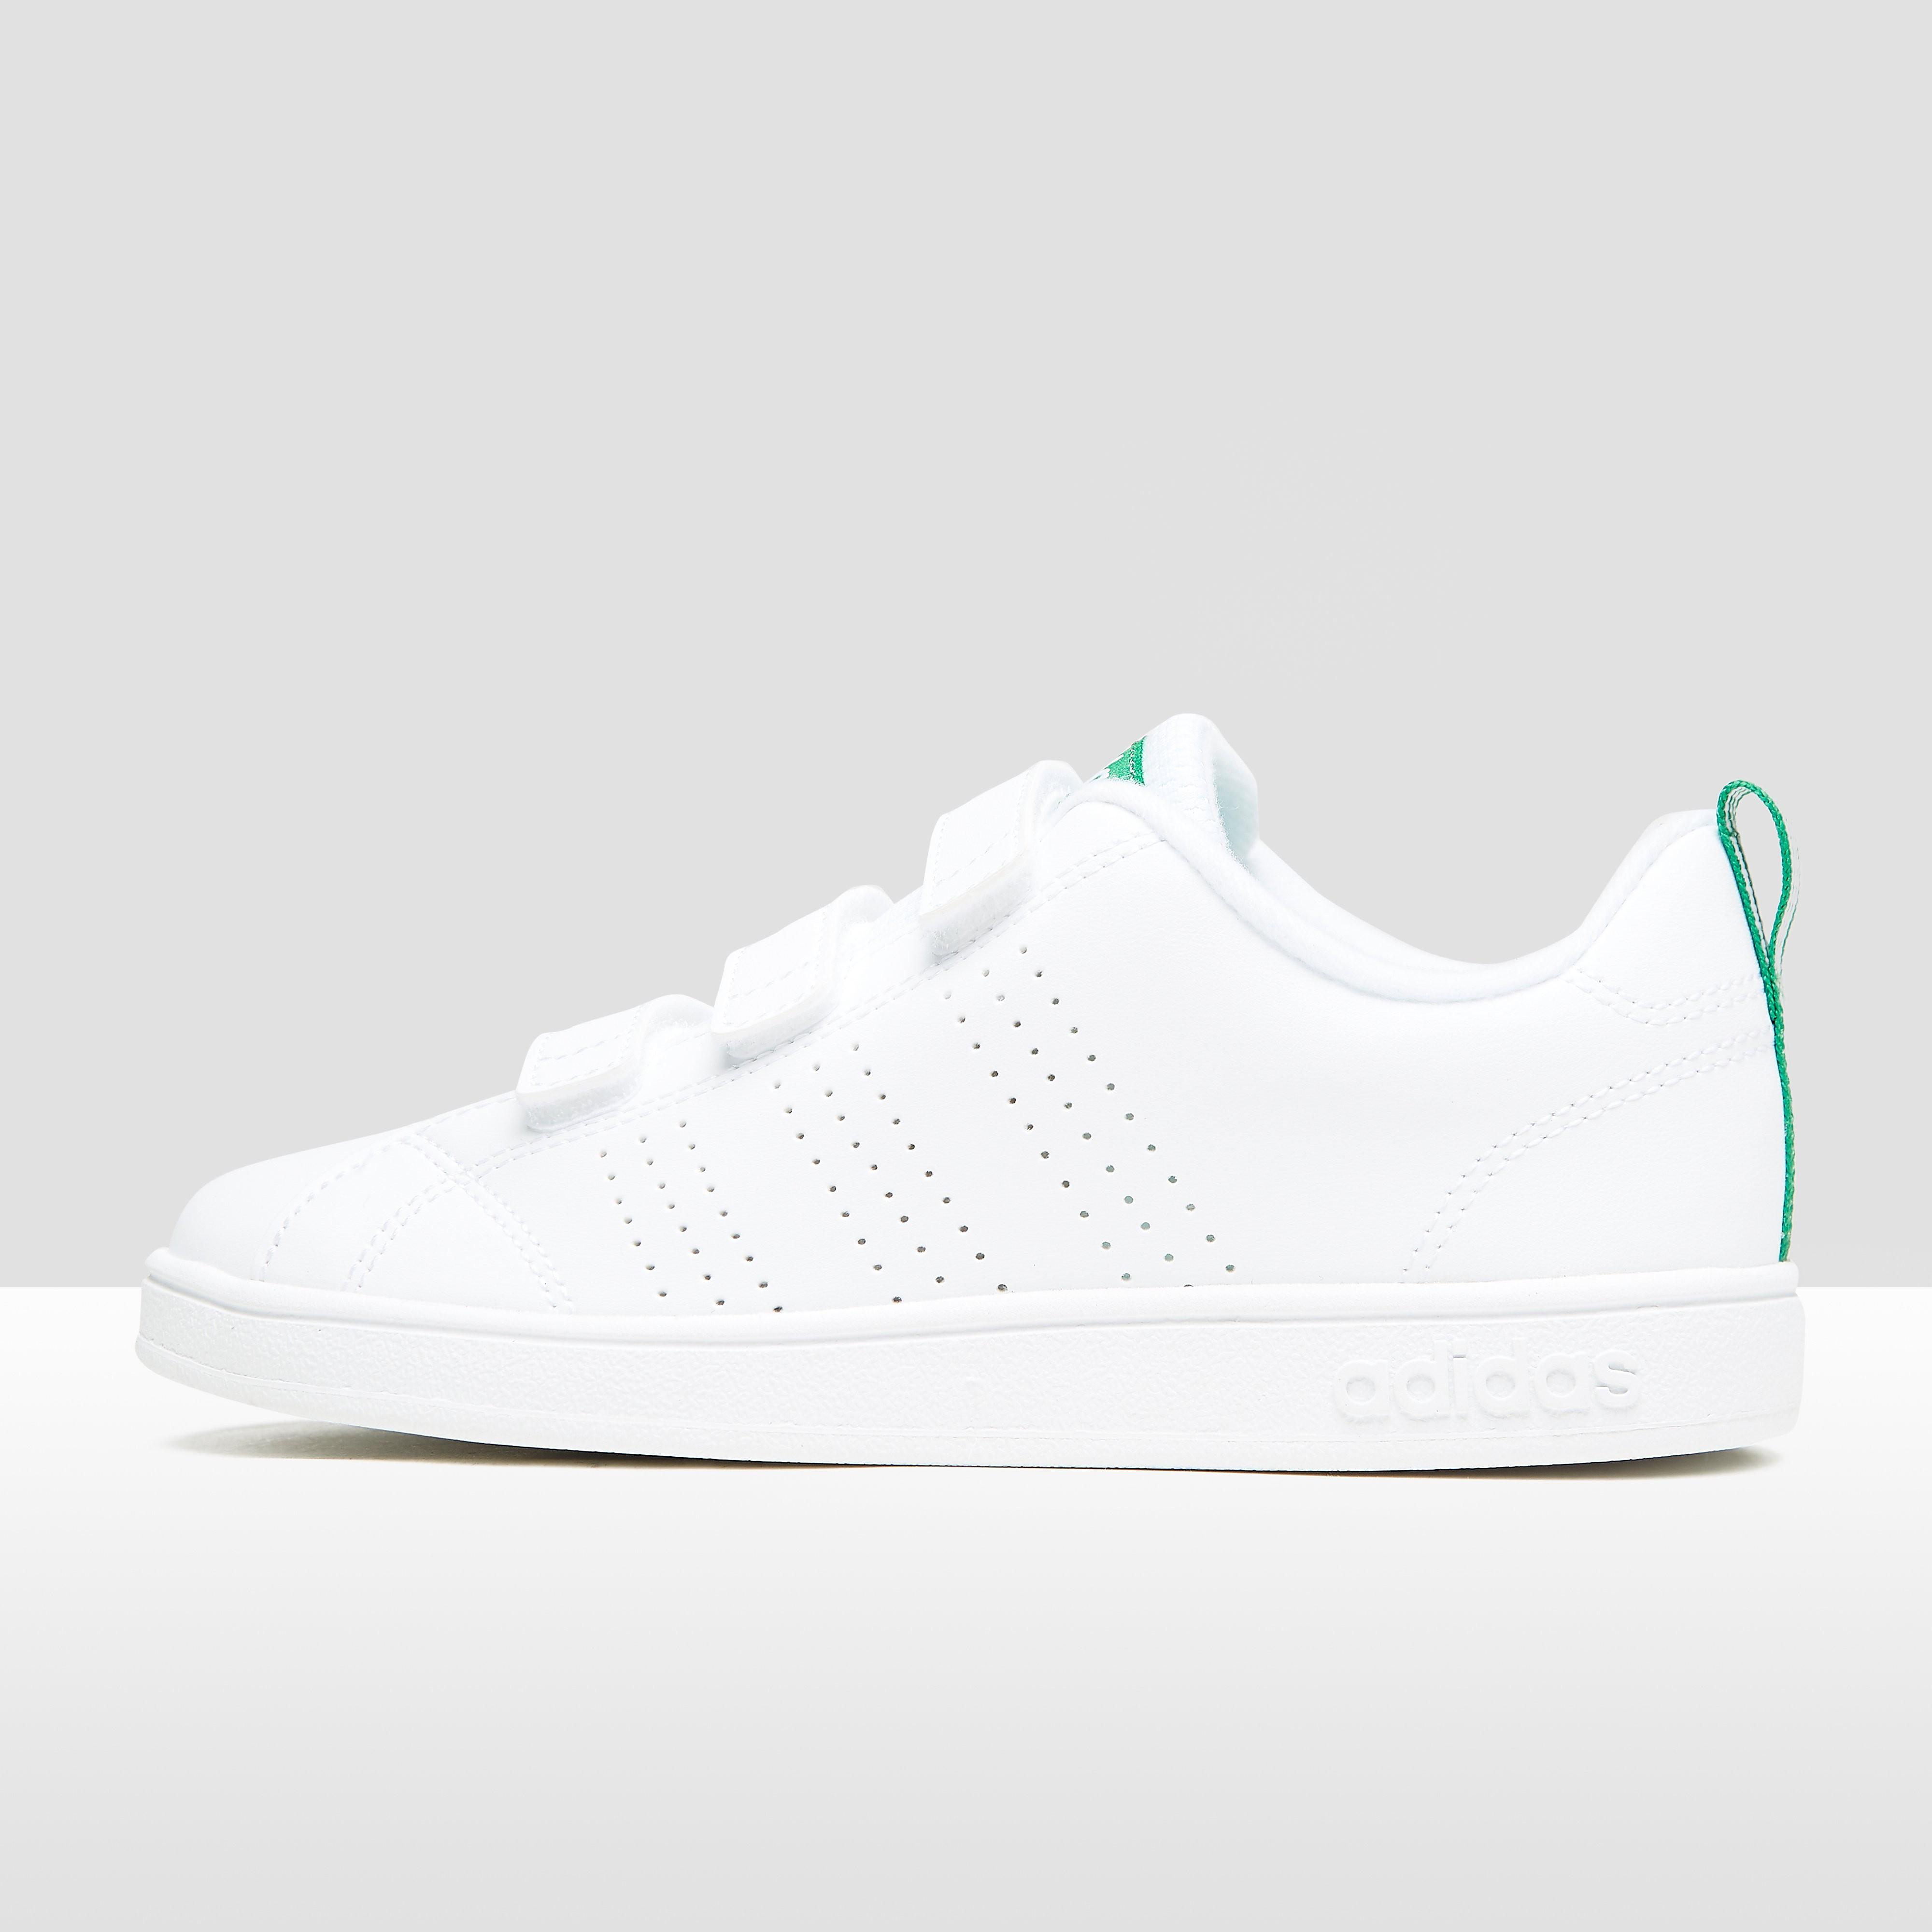 Tennisschoenen kinderen Neo Advantage Clean wit